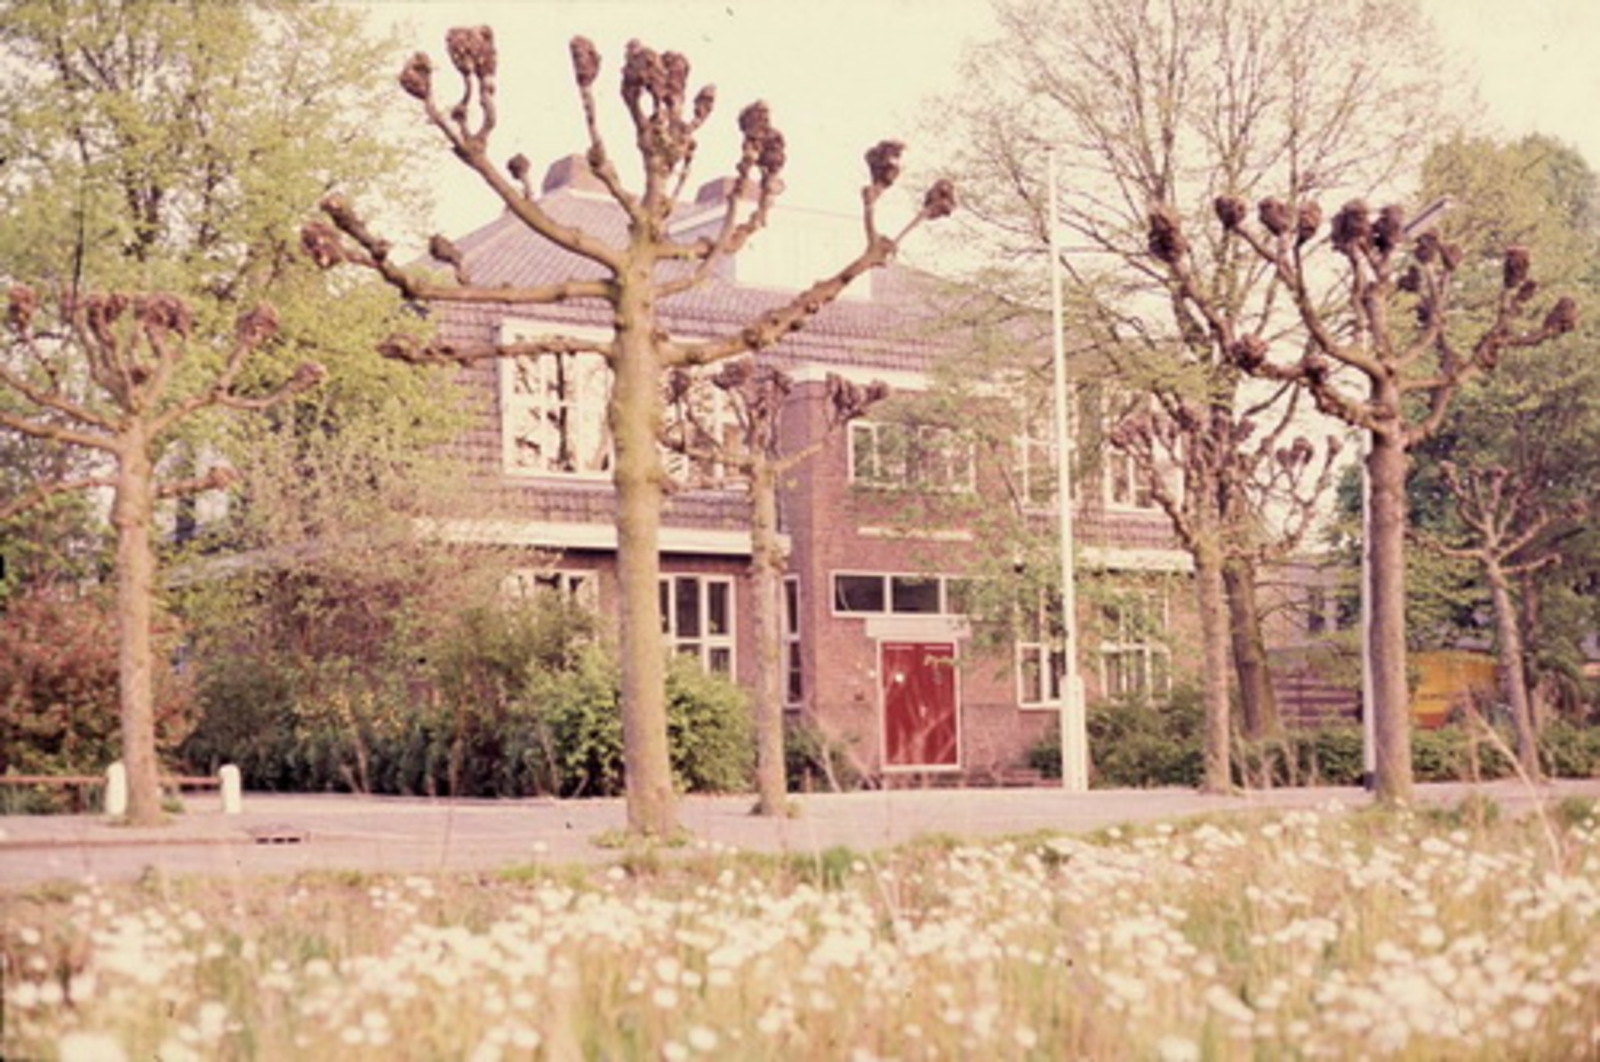 Julianalaan O 0046 197_ Middelb Landbouwschool